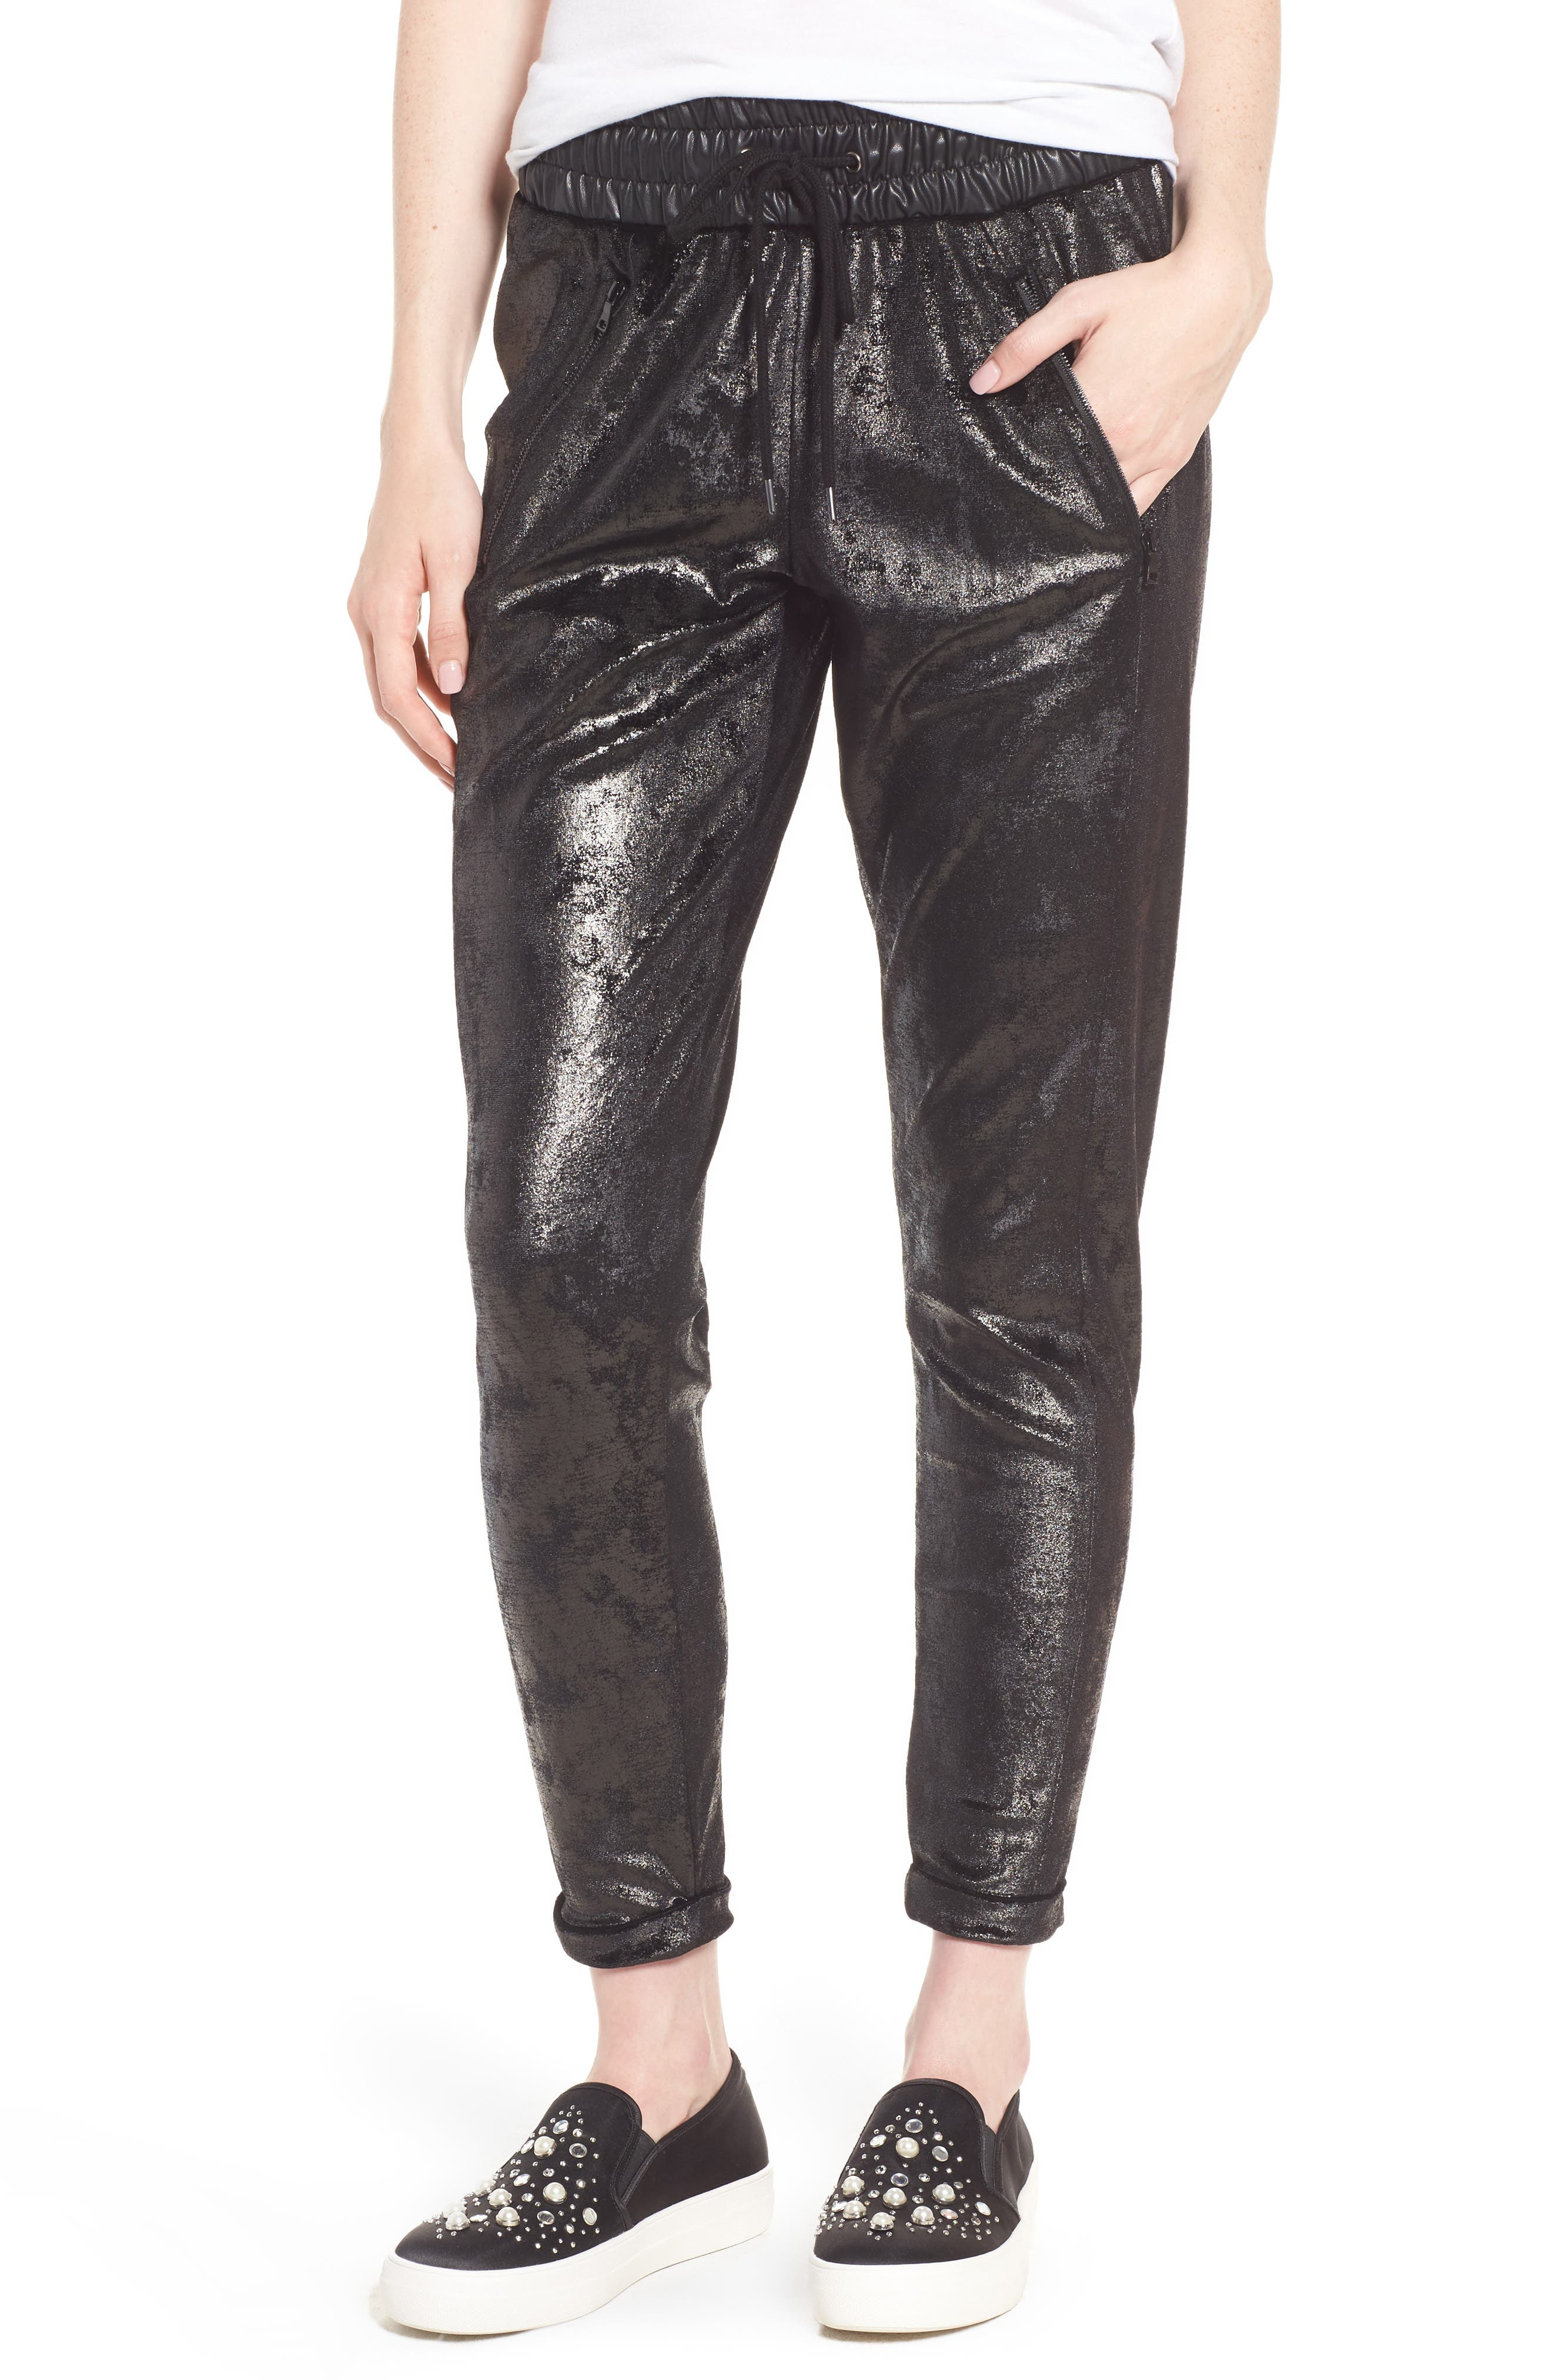 Randall Cuffed Sweatpants,                             Main thumbnail 1, color,                             Black